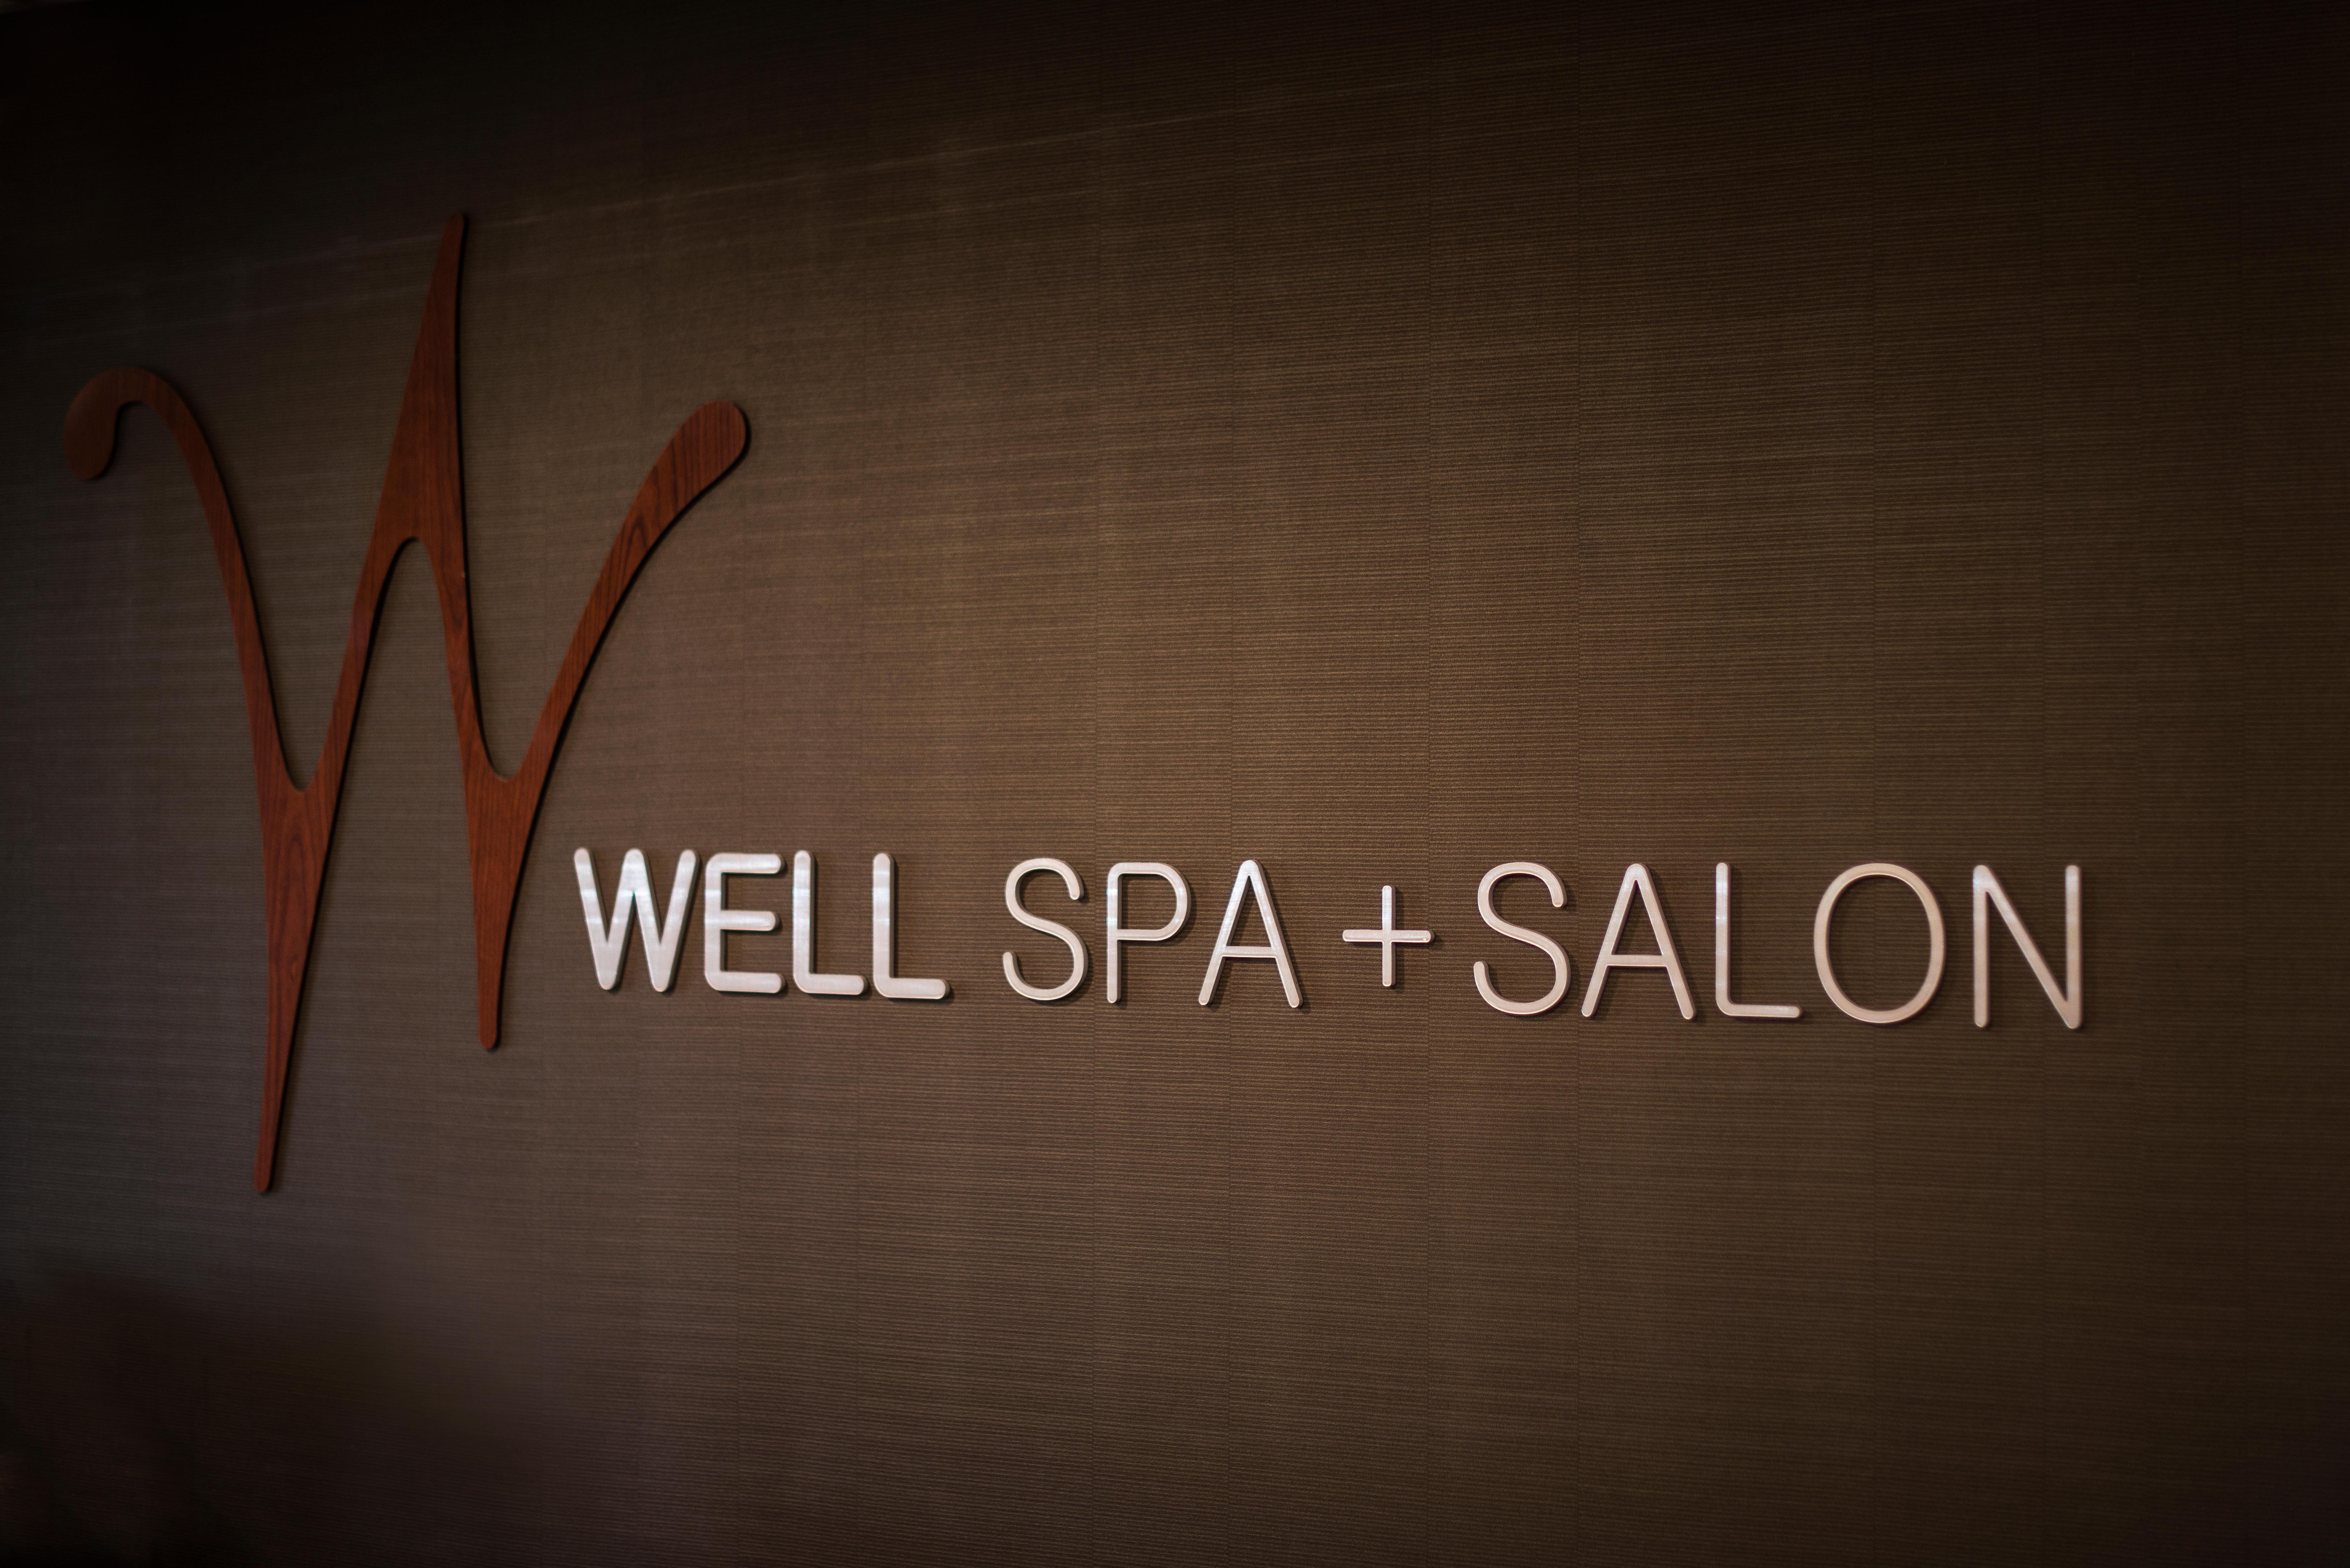 Well Spa + Salon image 6